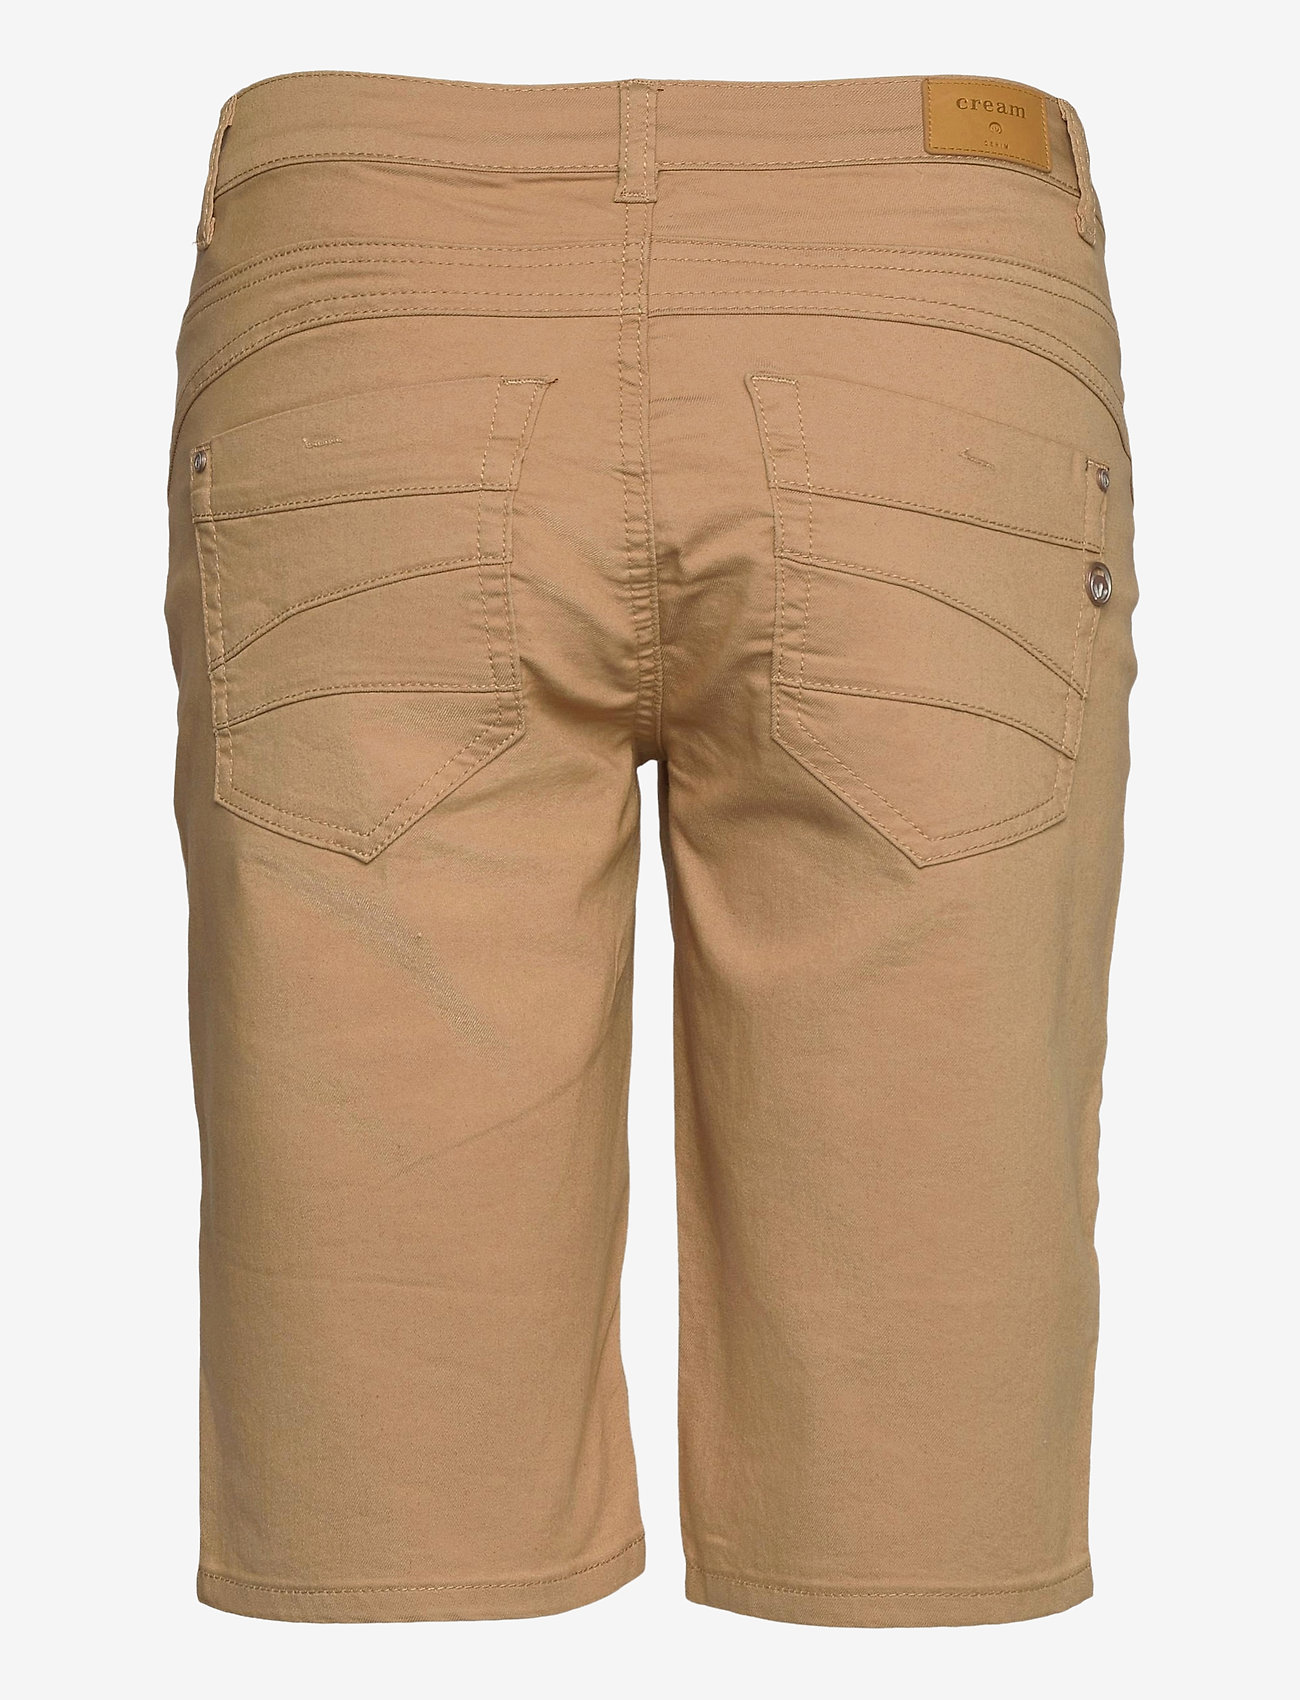 Cream - VavaCR Shorts - Coco Fit - bermudas - tannin - 1